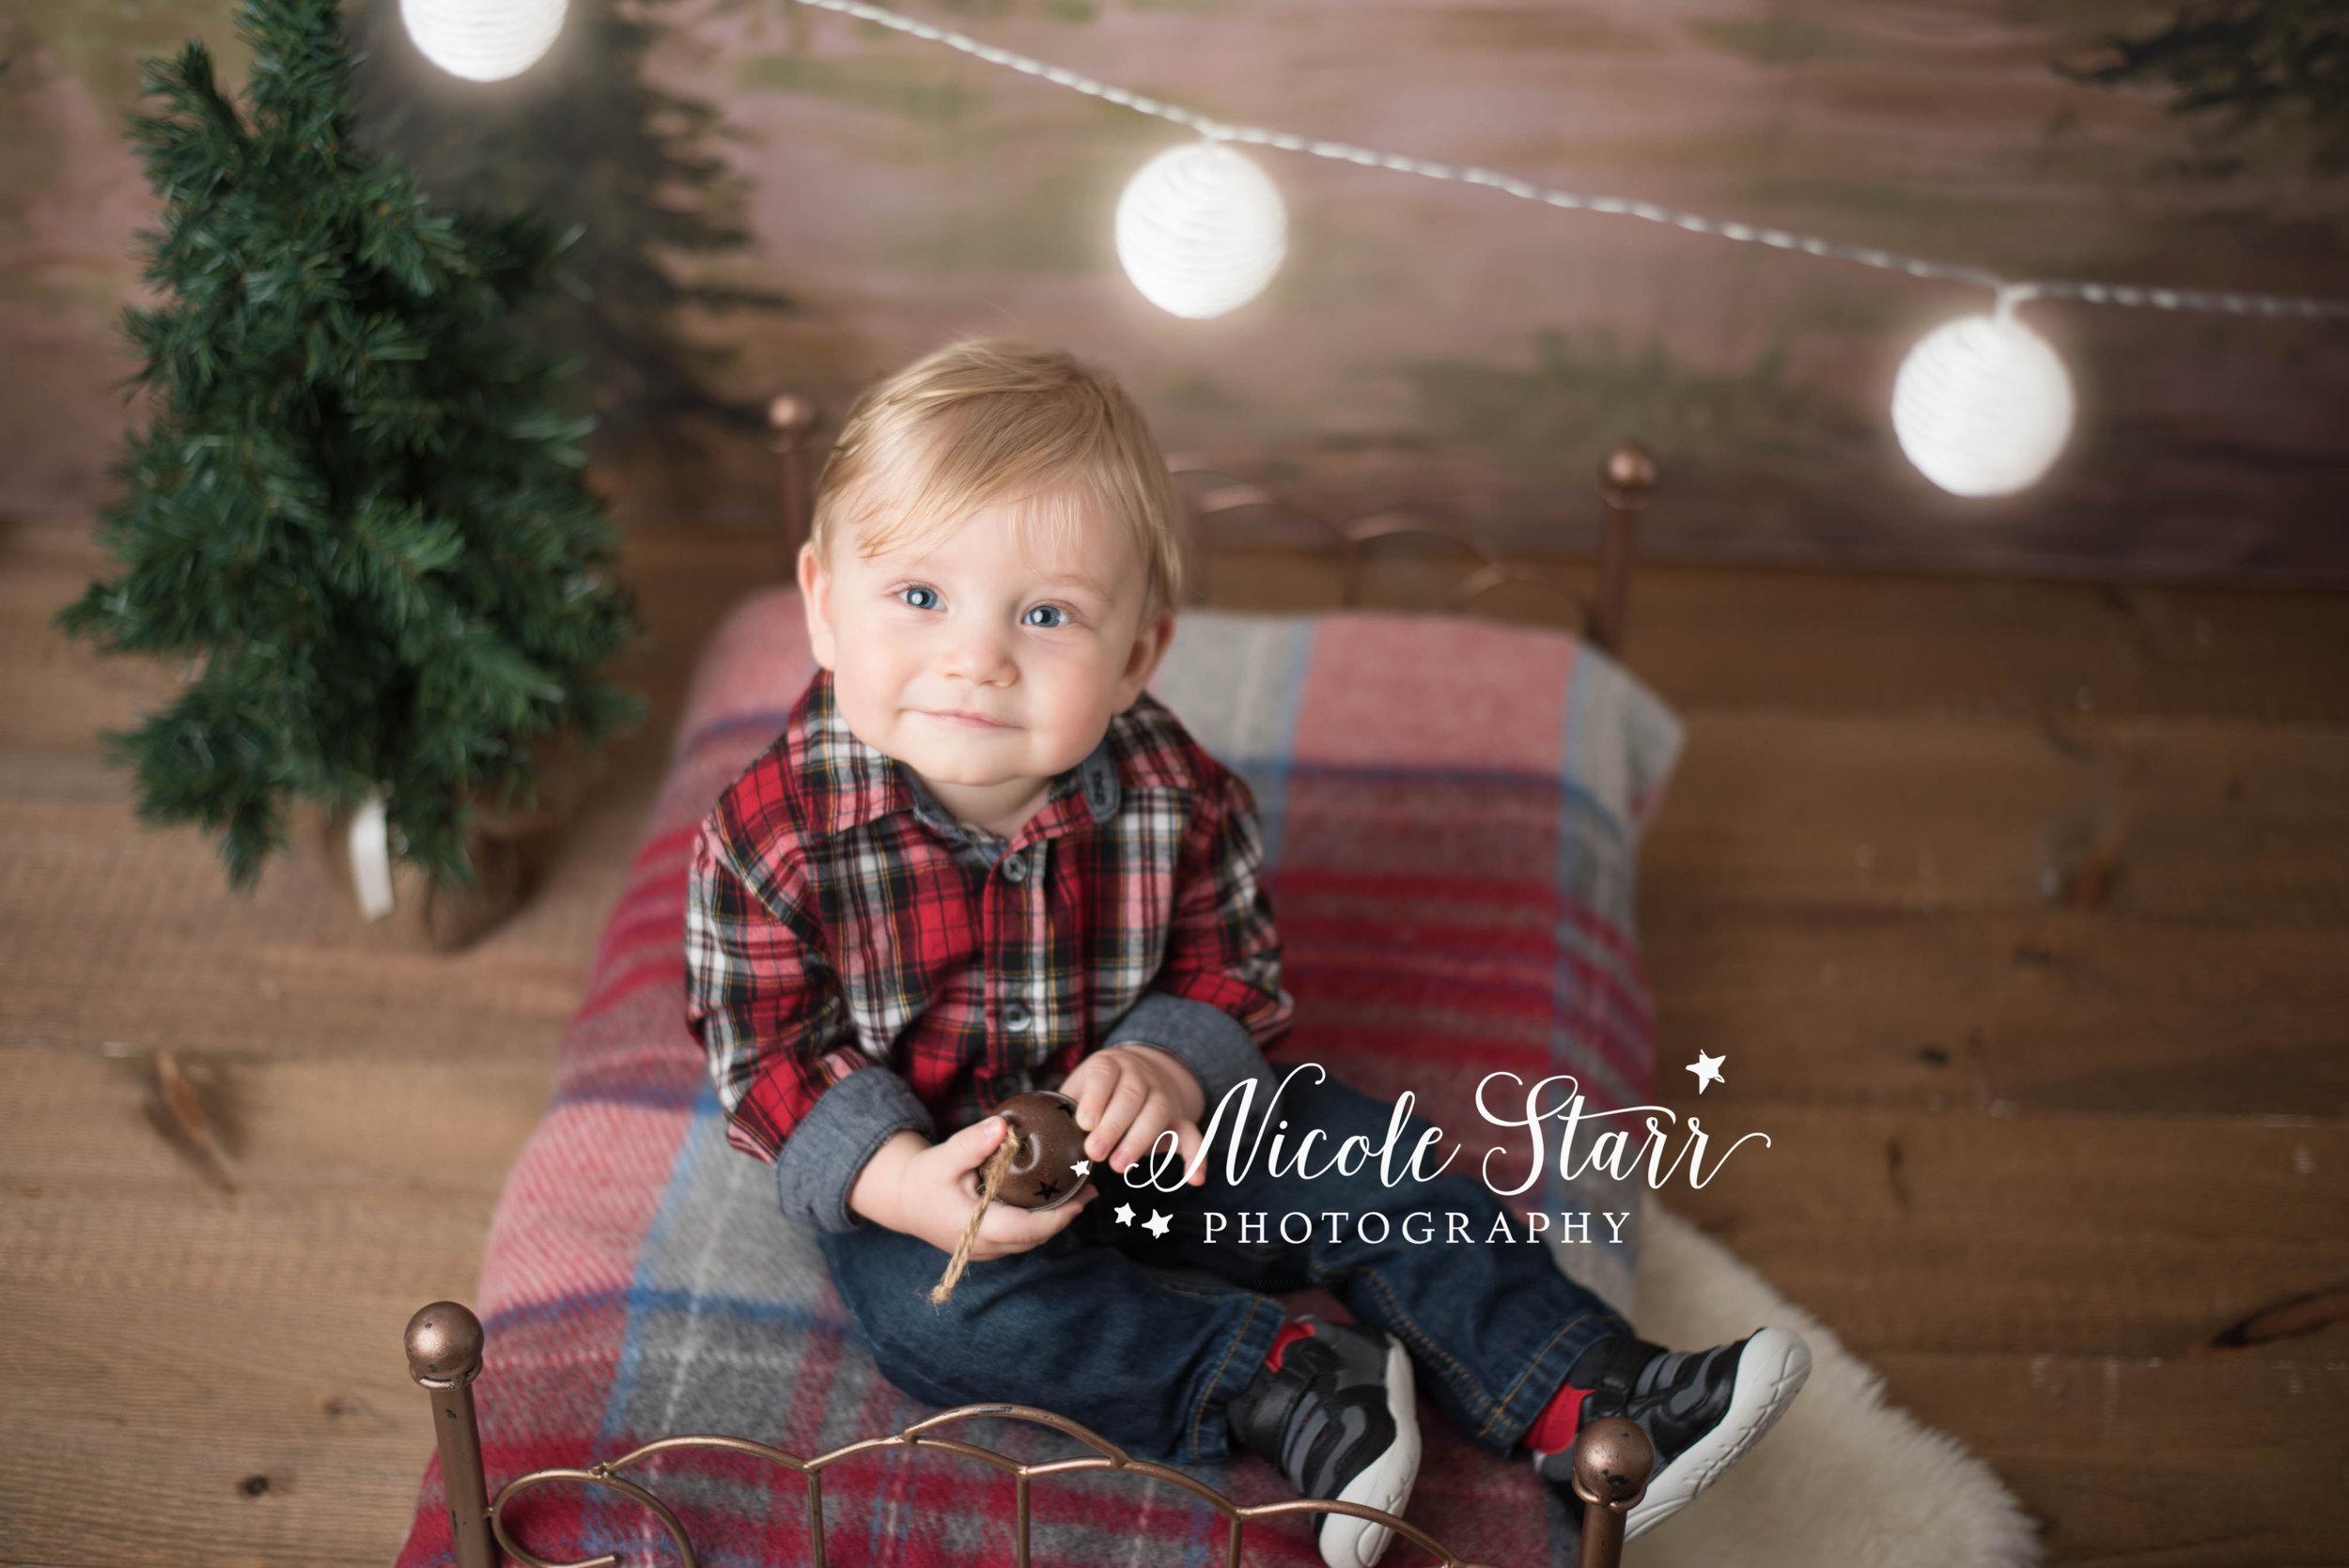 WM nicole starr photography-3 2.jpg